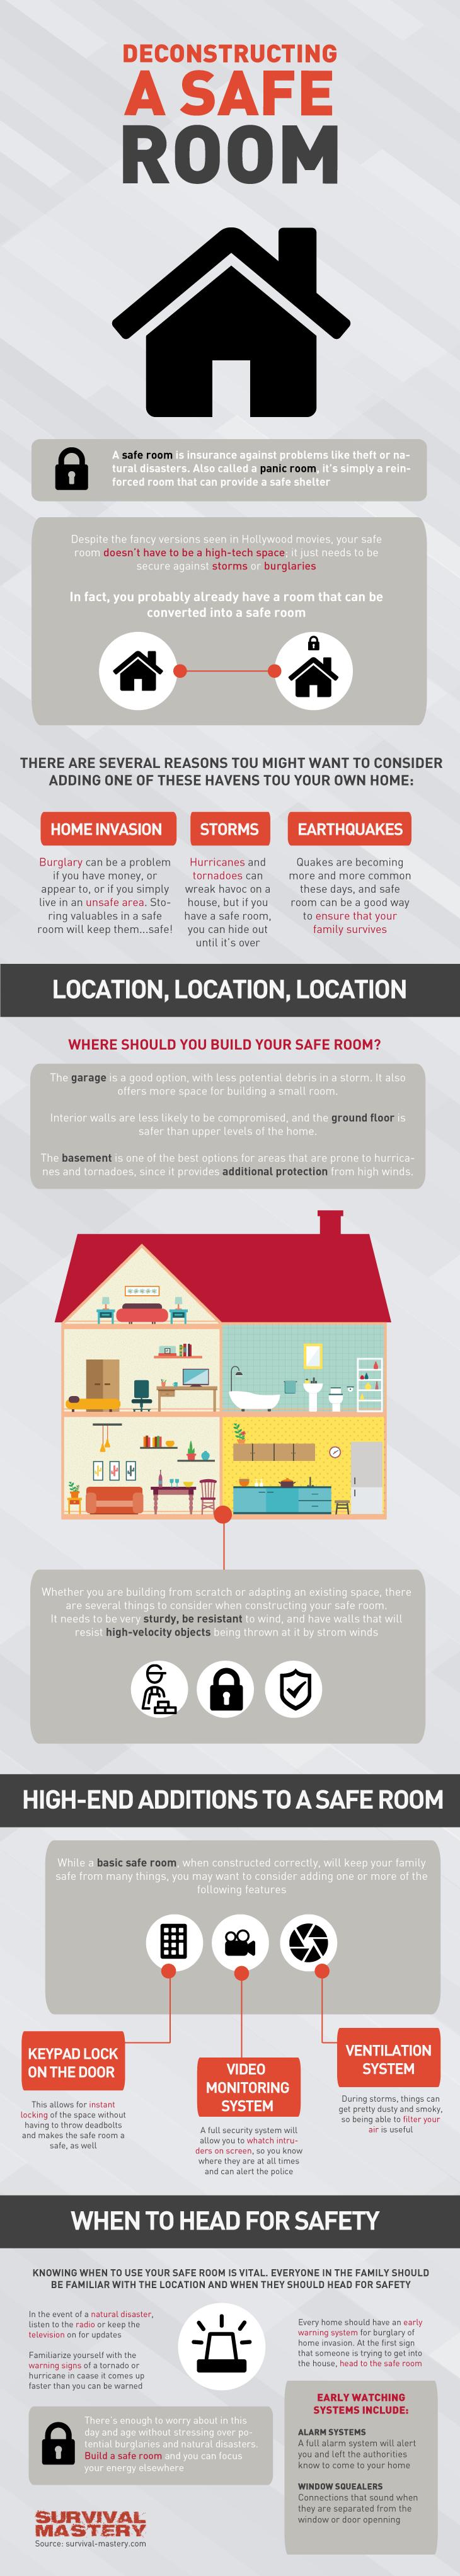 Deconstructing safe room infographic